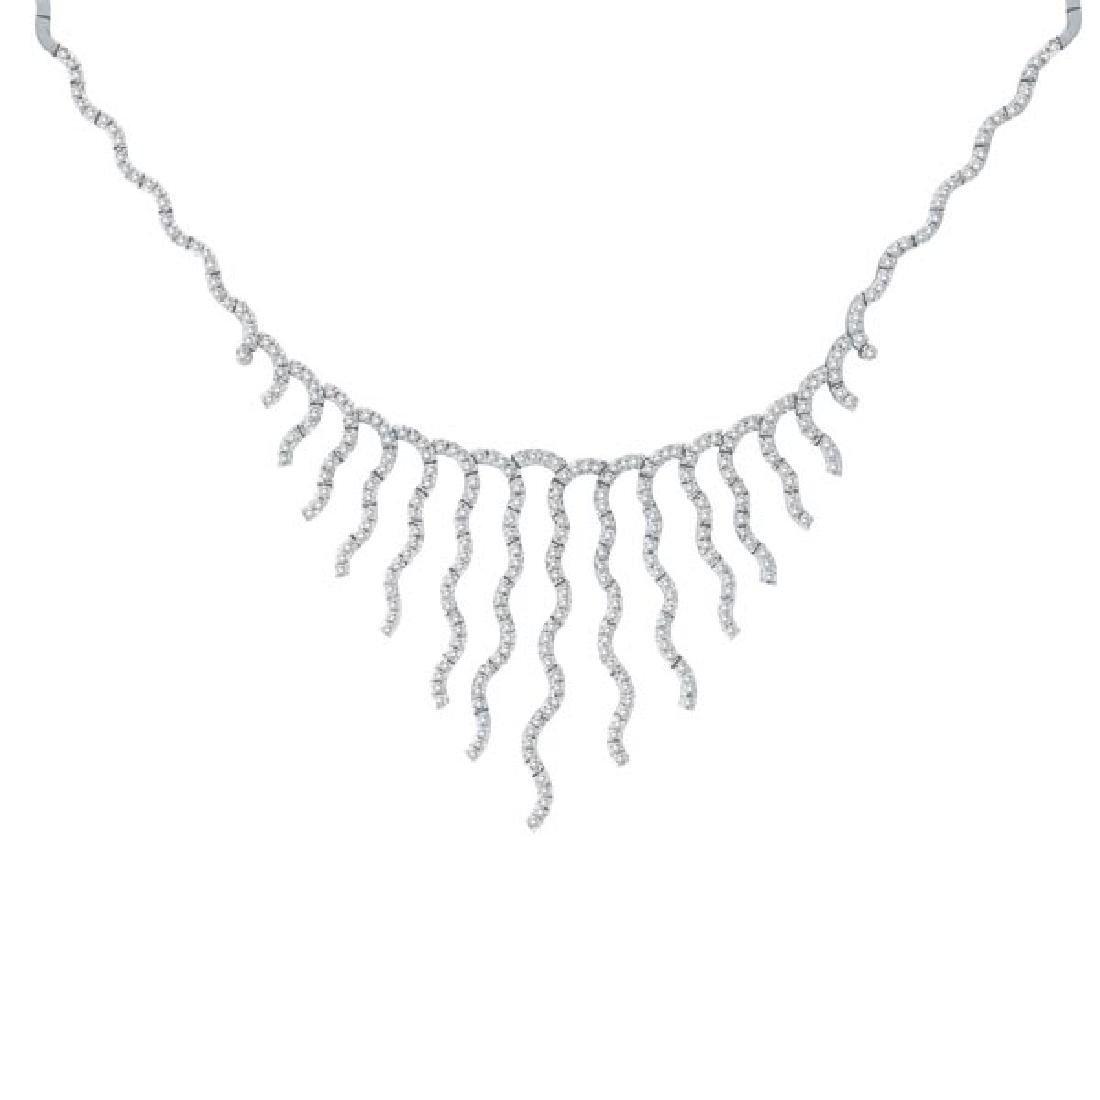 Diamond Bridal Choker Necklace 14k White Gold (3.04 ctw